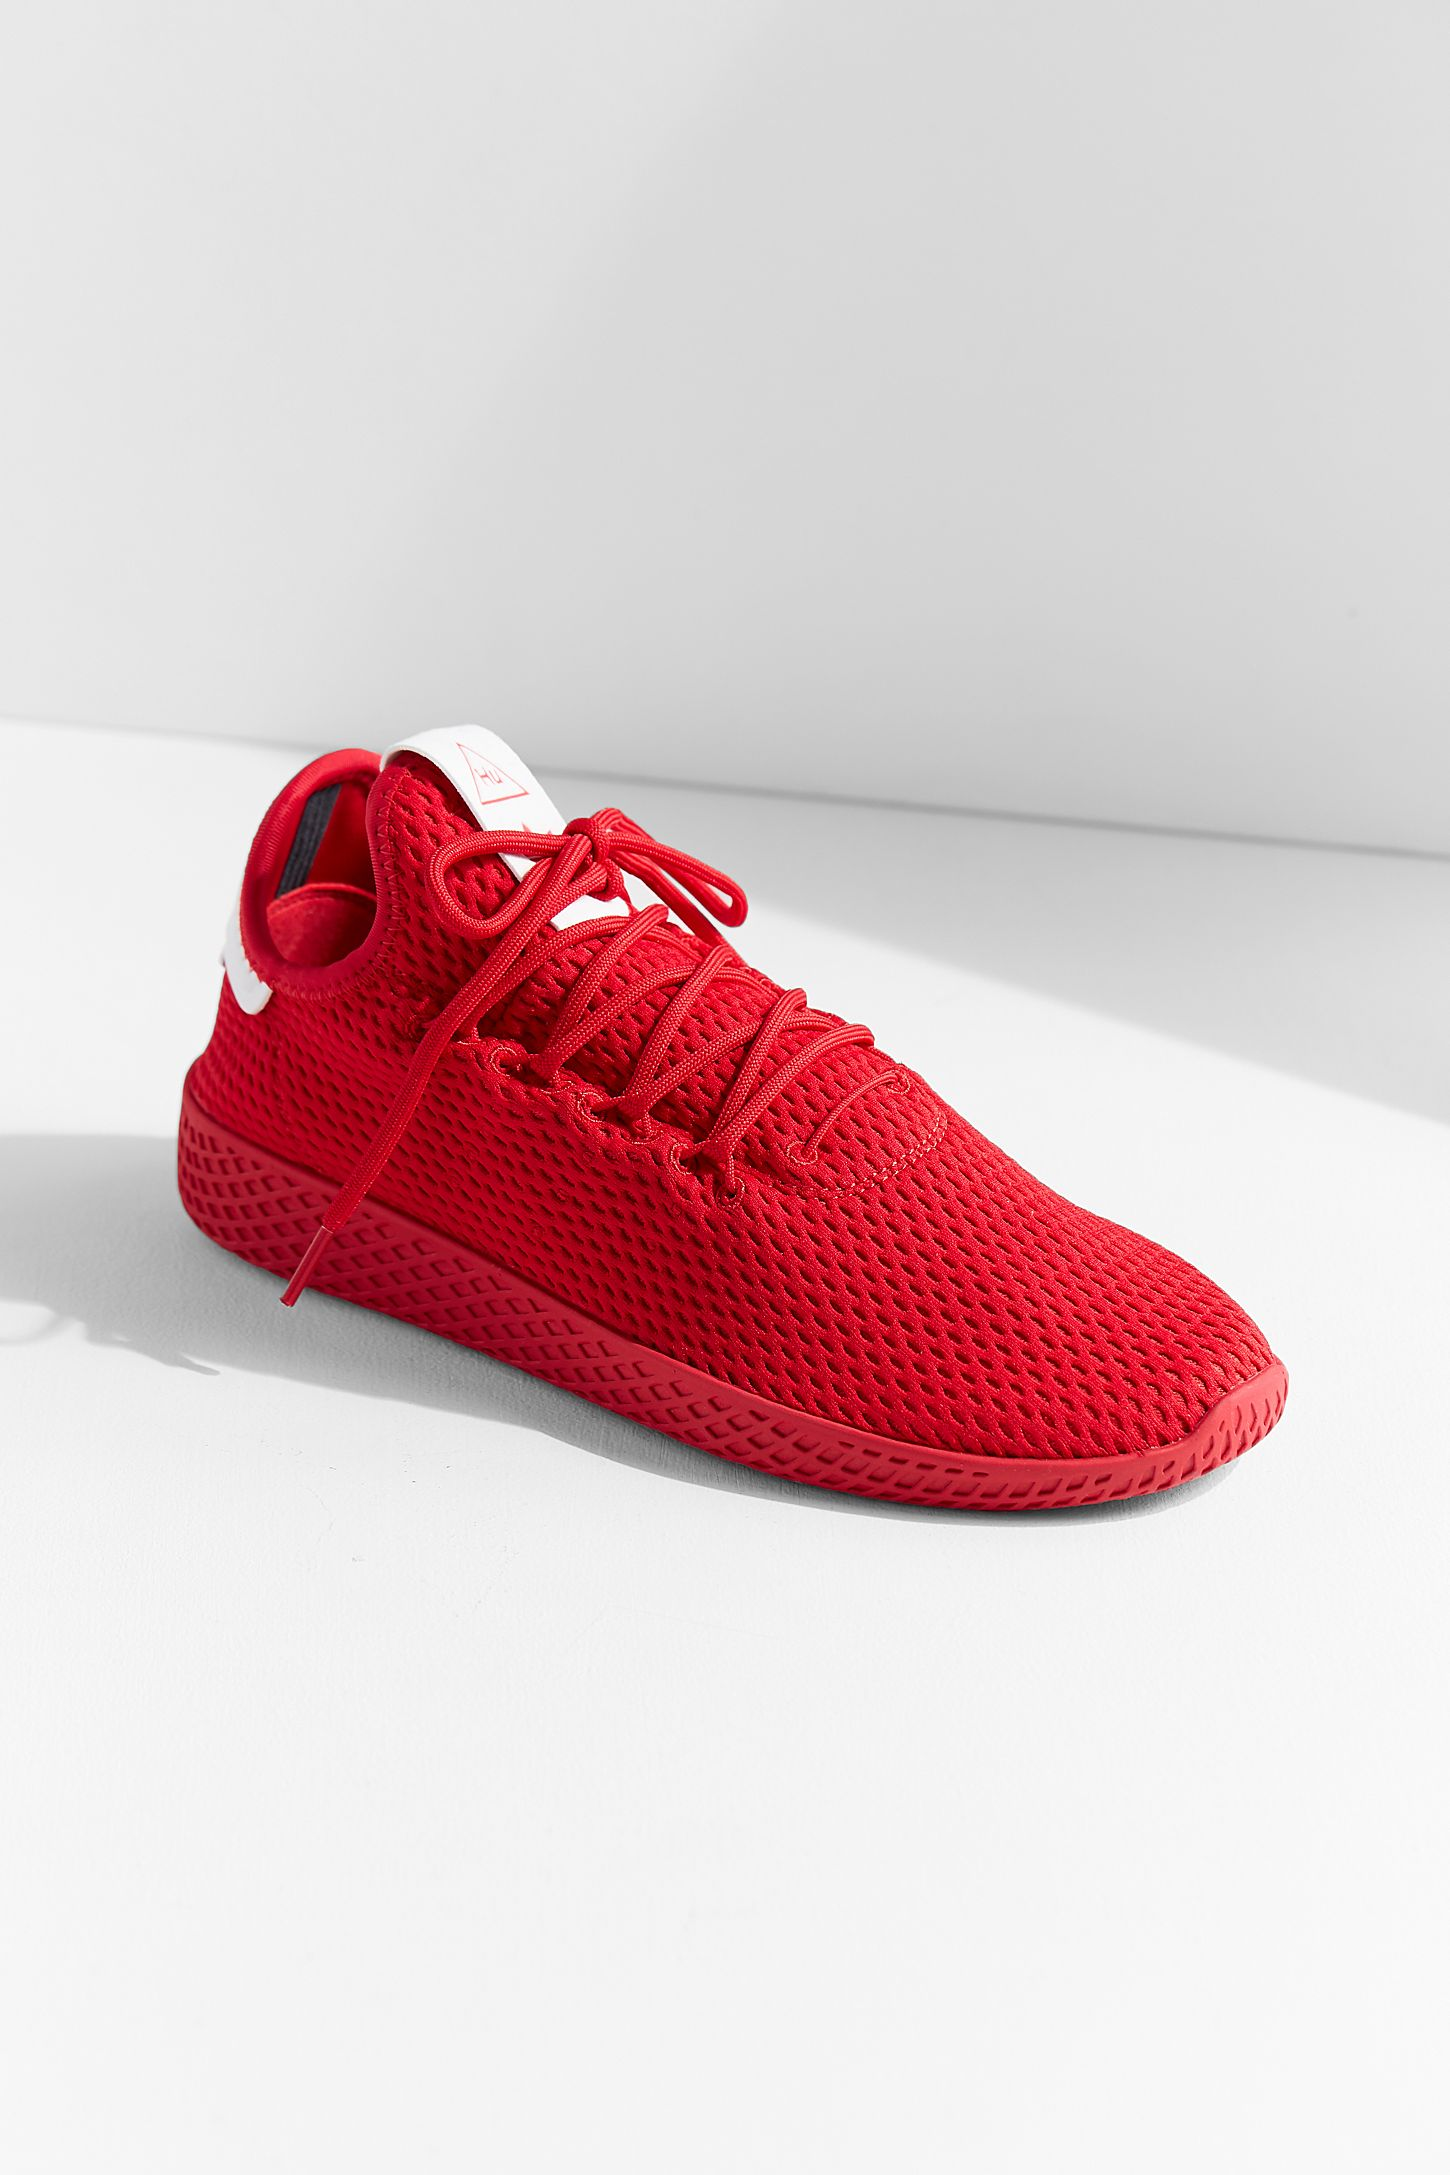 13e1a3ec9be6b adidas Pharrell Williams Tennis Hu Primary Sneaker